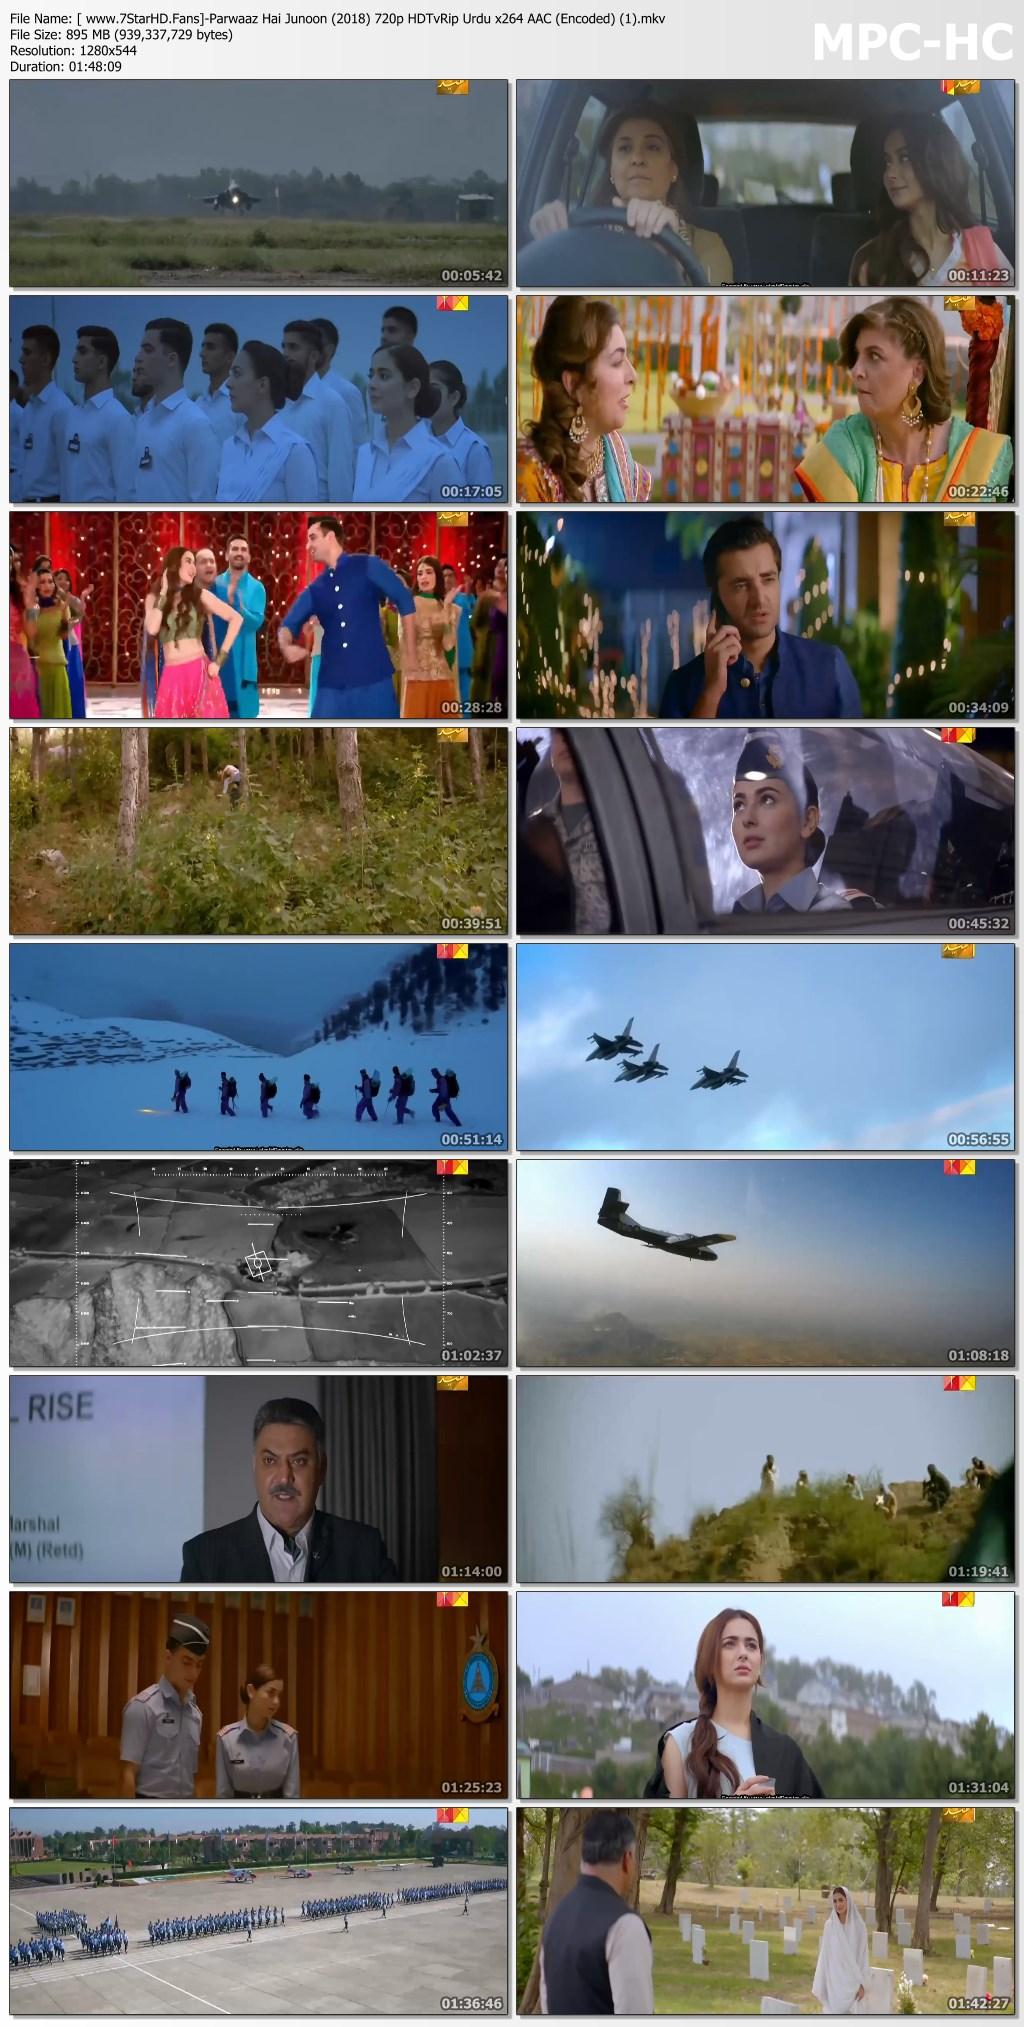 Parwaaz Hai Junoon (2018) Urdu/Hindi HDTV 480p & 720p | GDRive 1